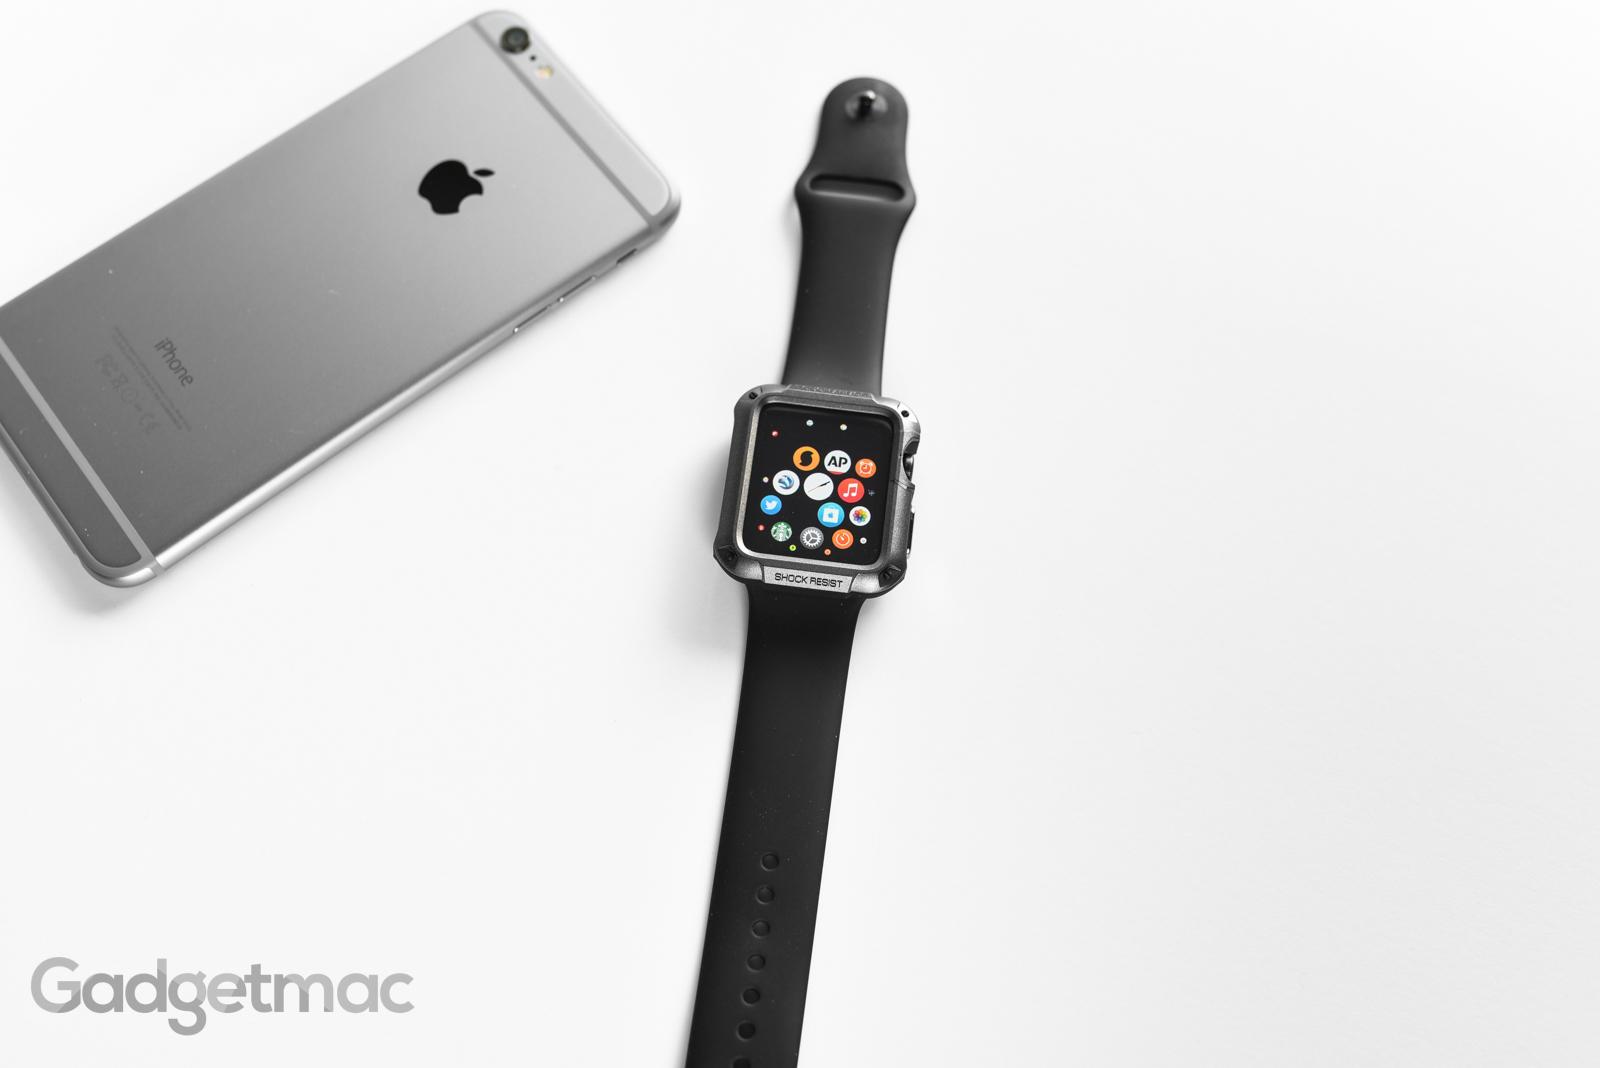 spigen-tough-armor-case-for-apple-watch-2.jpg